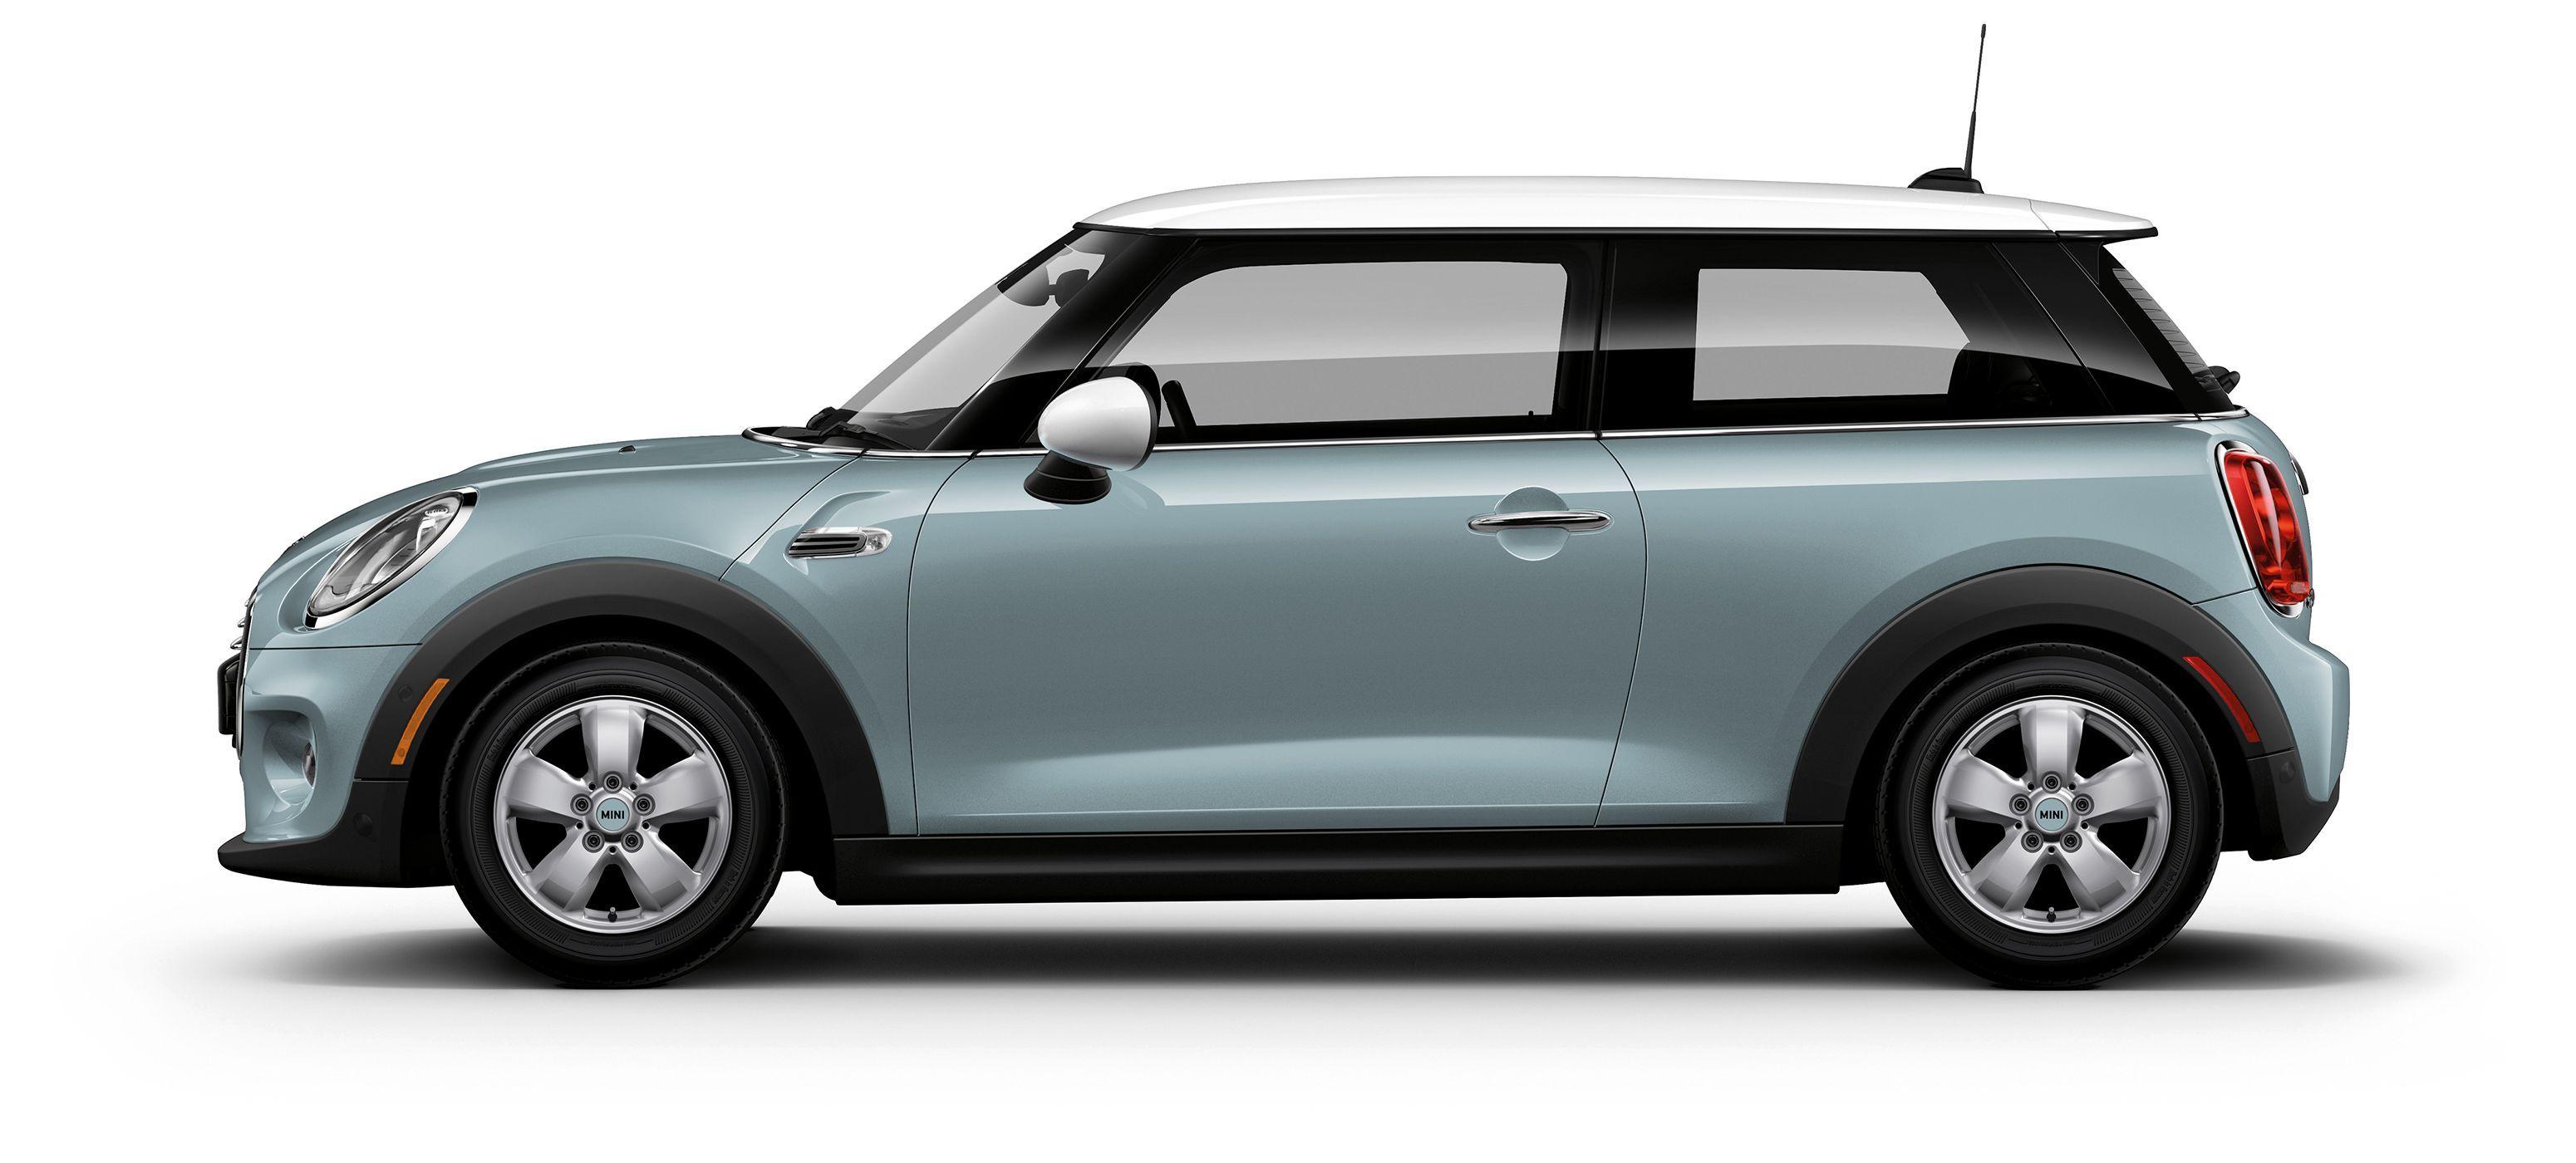 2018 Ice Blue Mini Cooper Love Mini Dealership Blue Mini Cooper Mini Usa